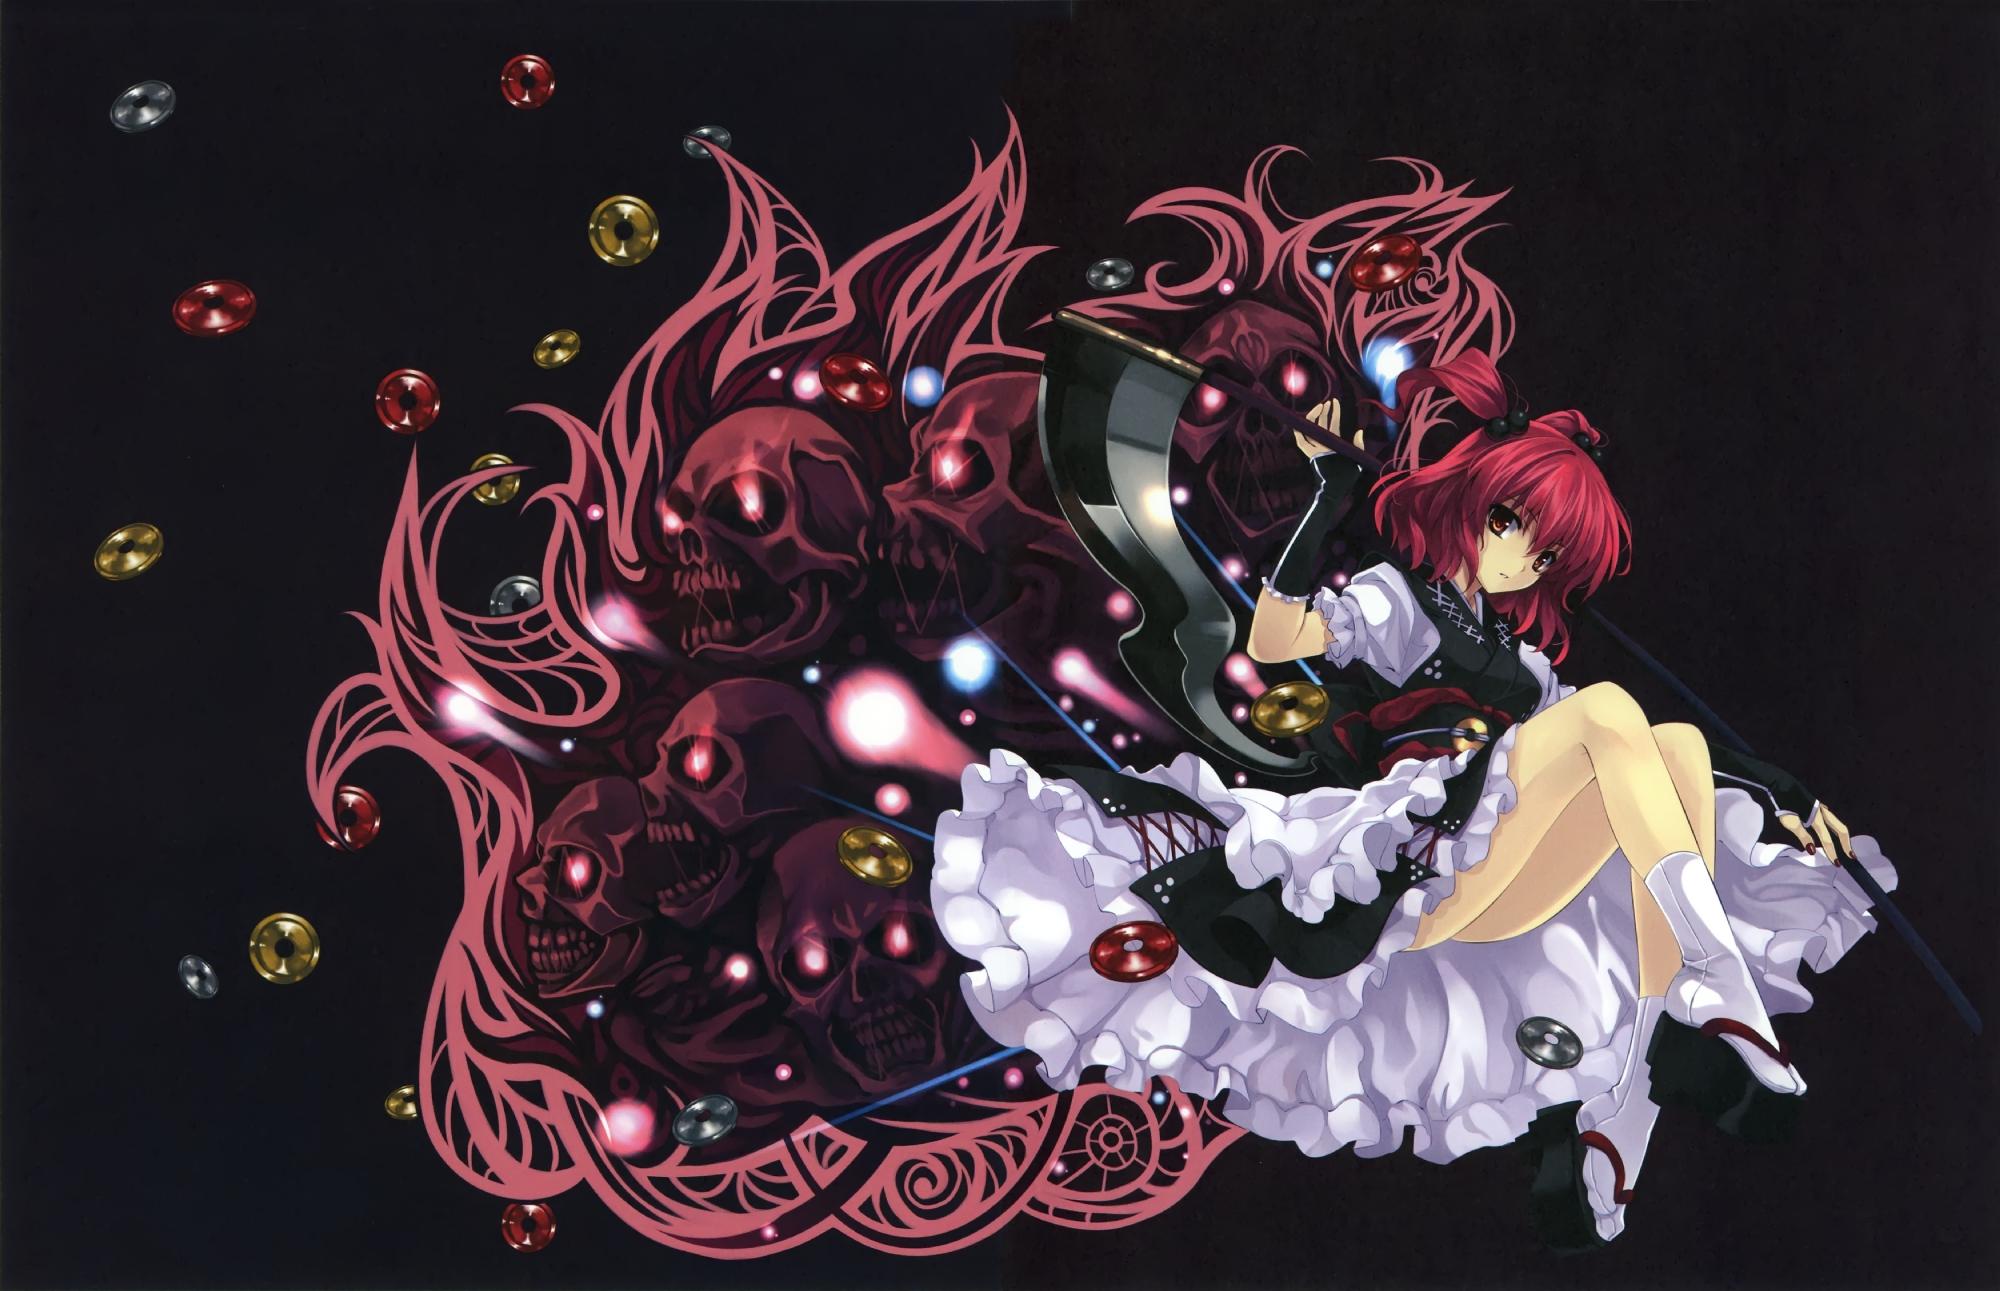 cradle misaki_kurehito onozuka_komachi red_eyes red_hair scythe short_hair touhou twintails weapon